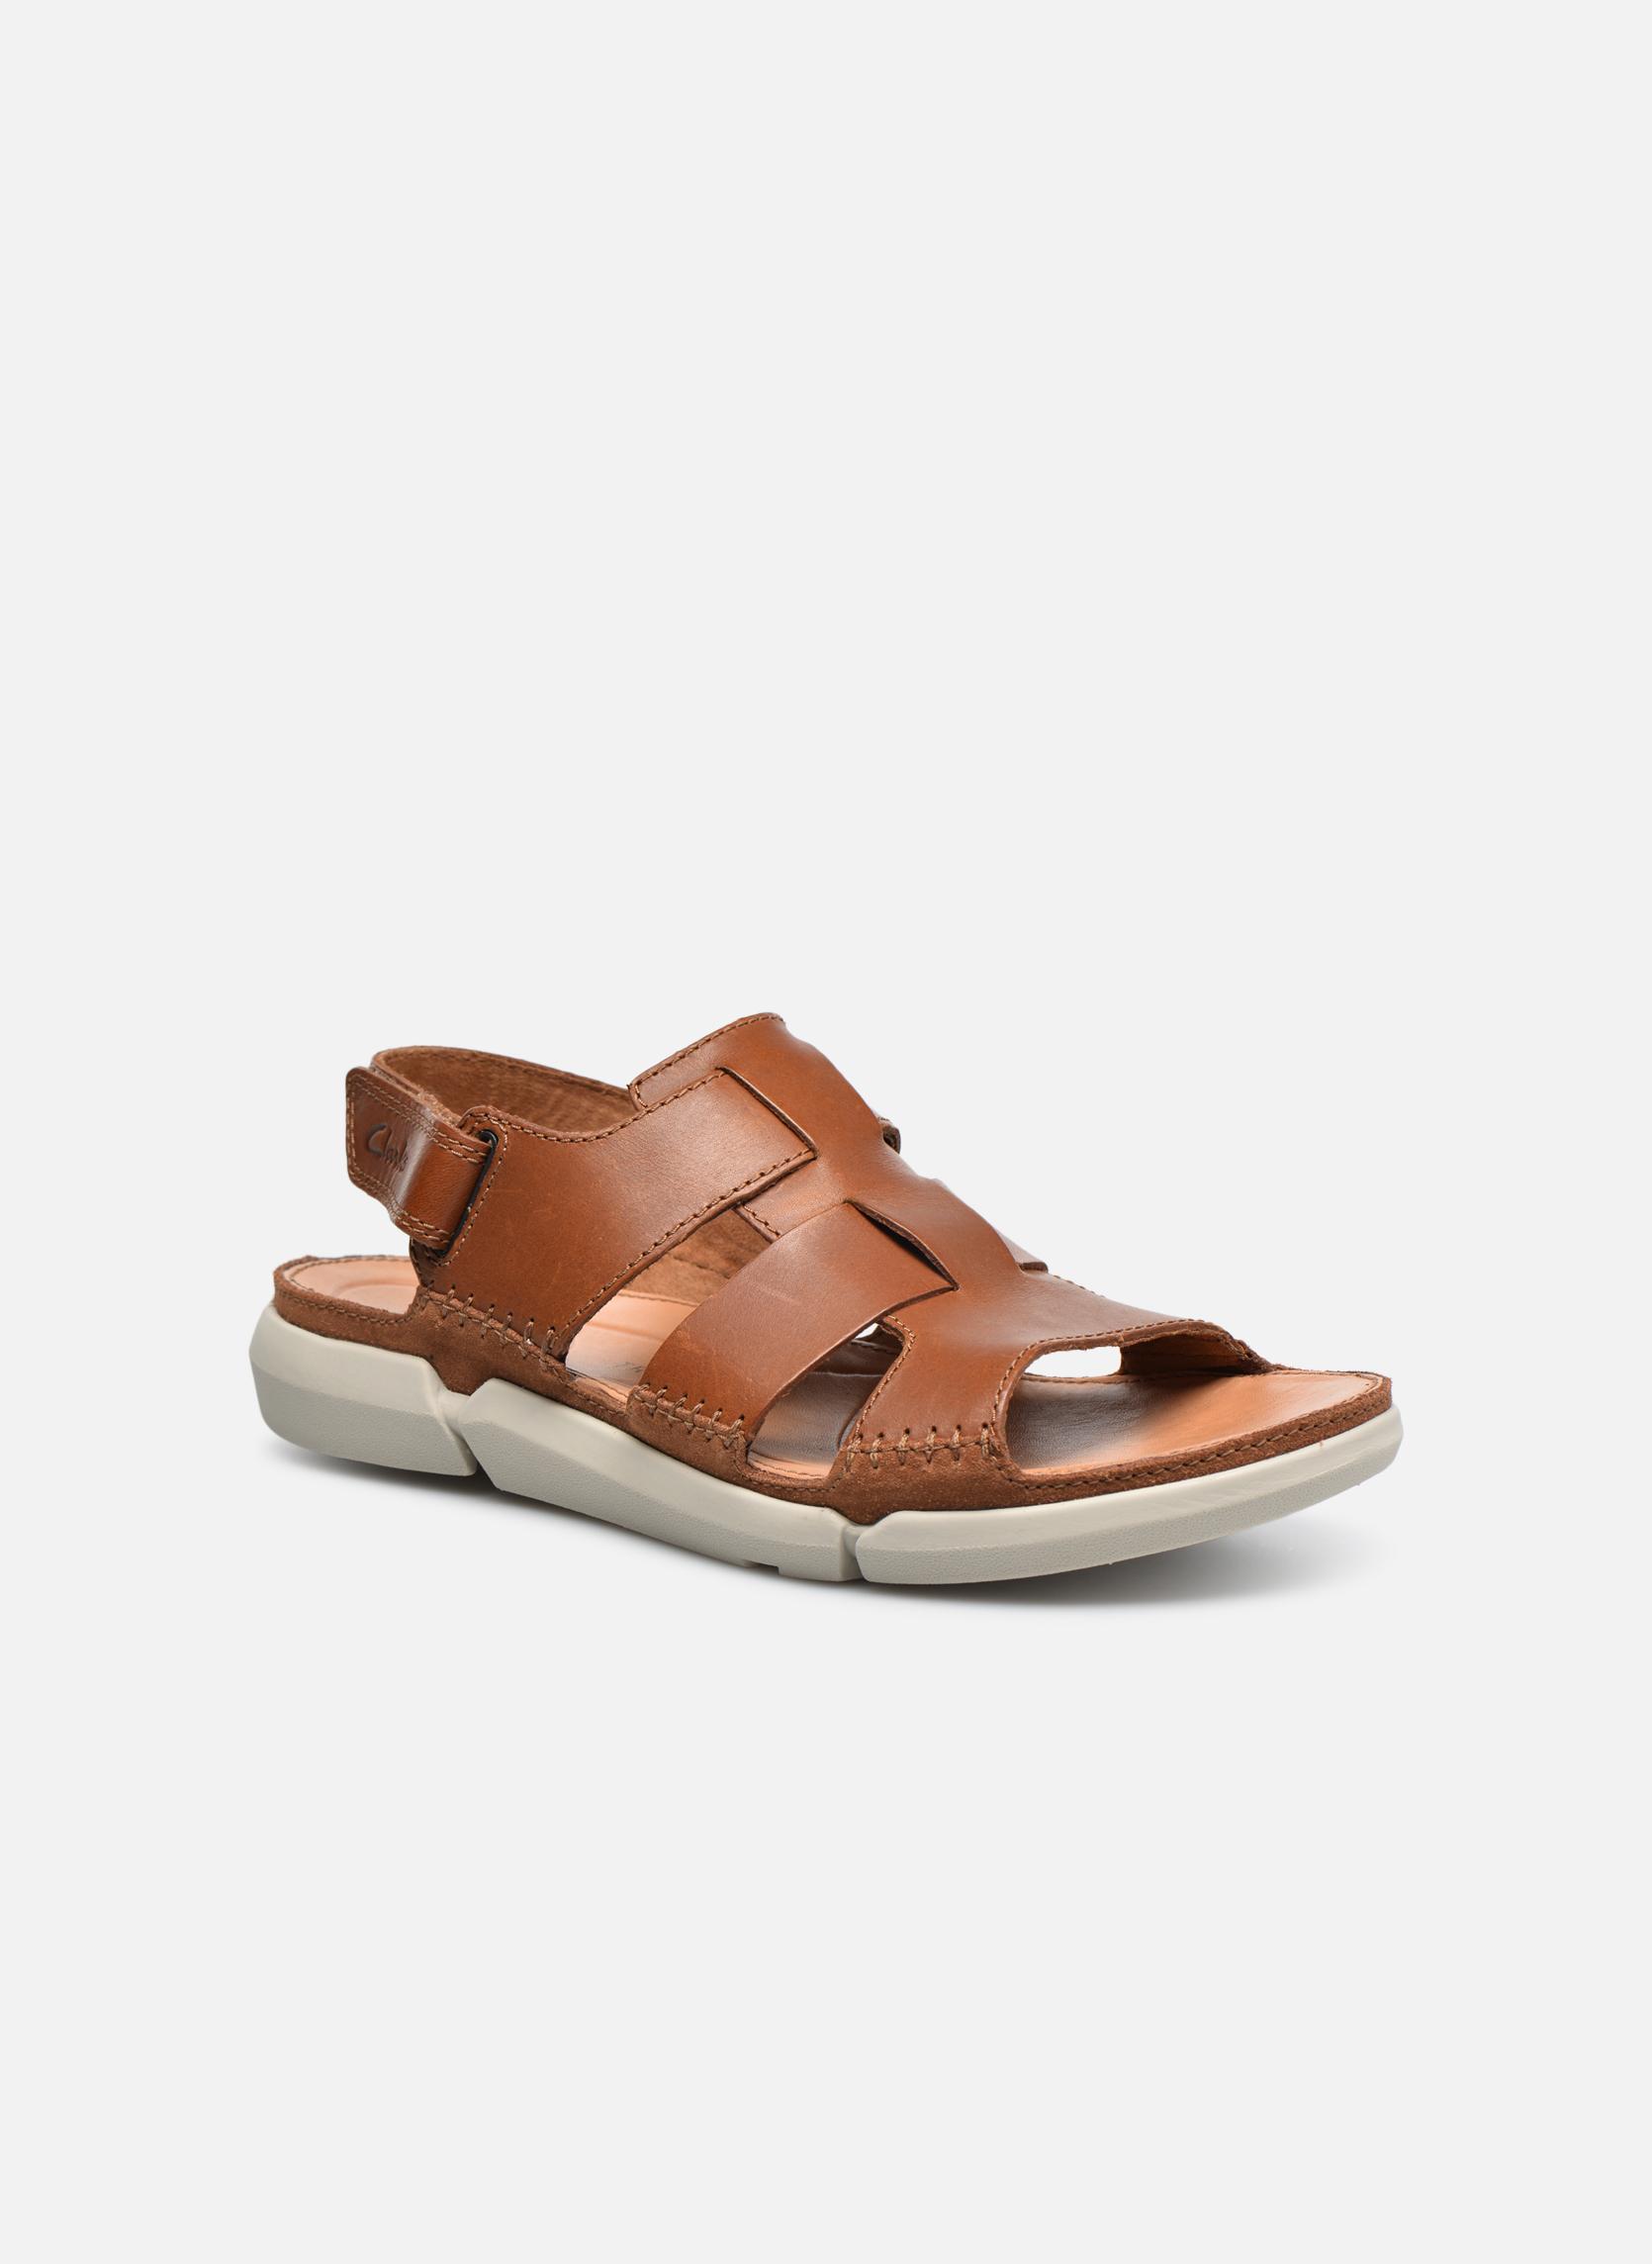 Sandals Men Trisand Bay